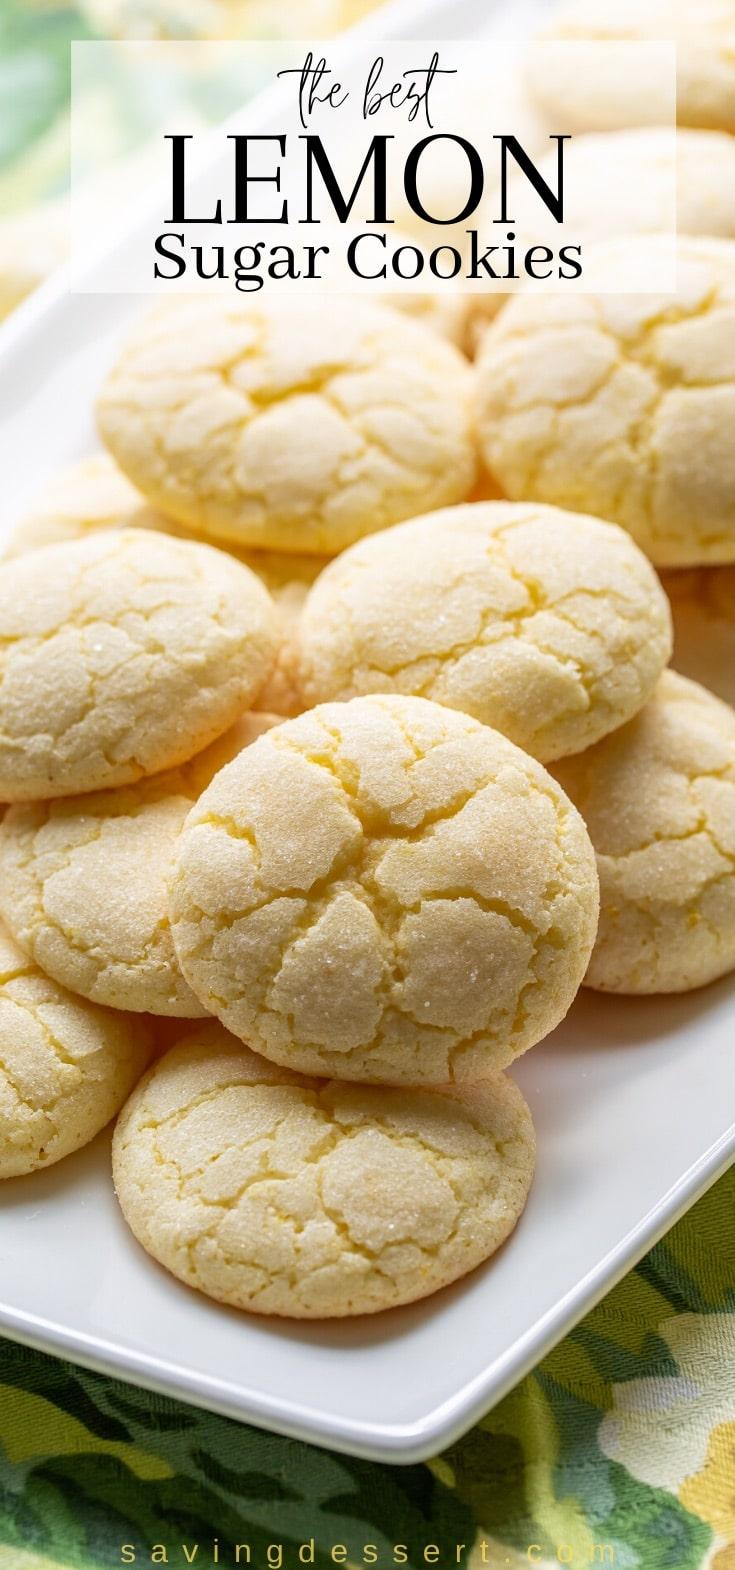 A platter of lemon sugar cookies